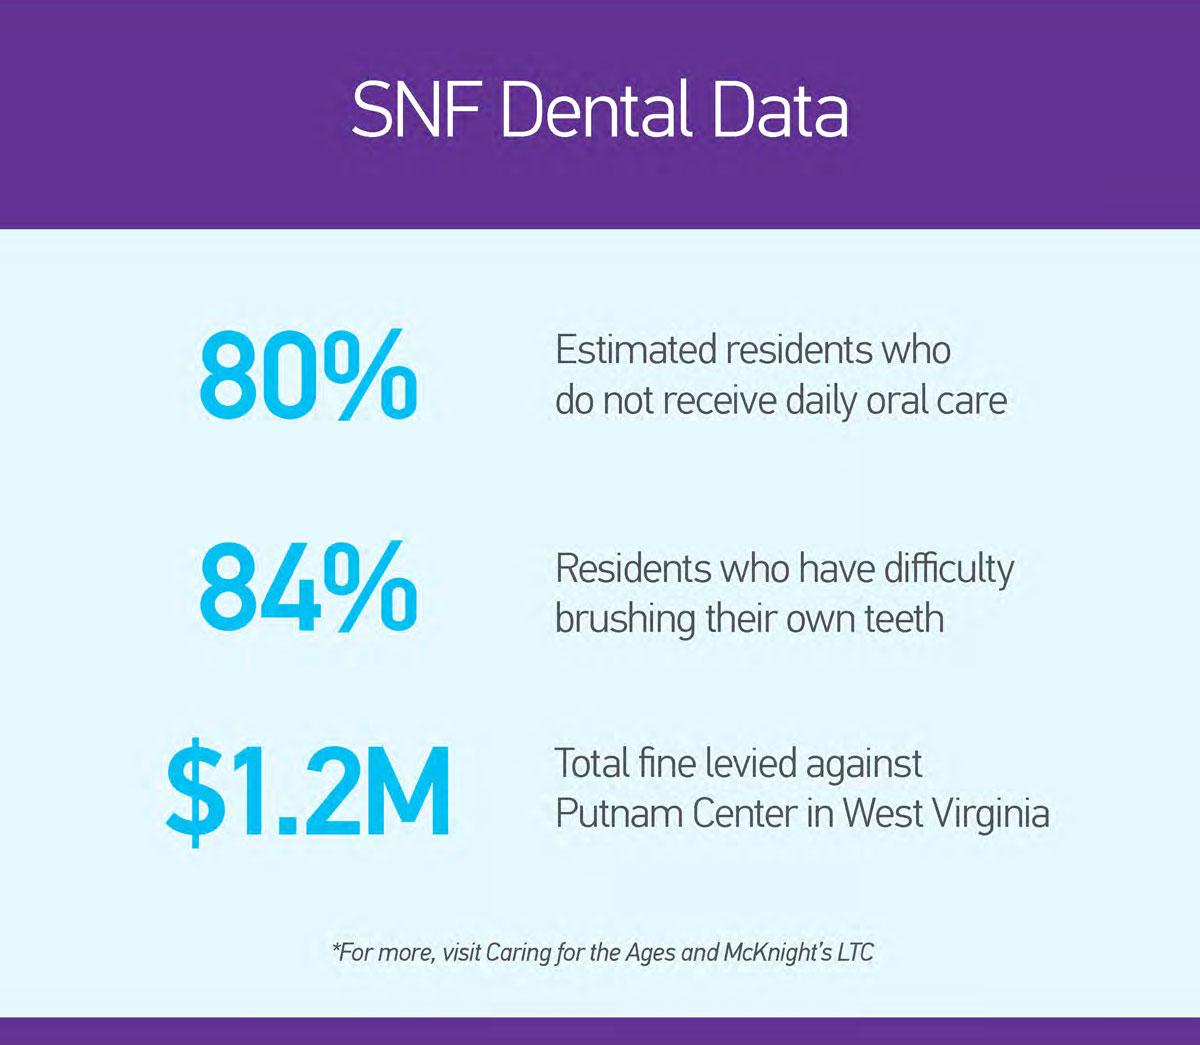 SNF Dental Data